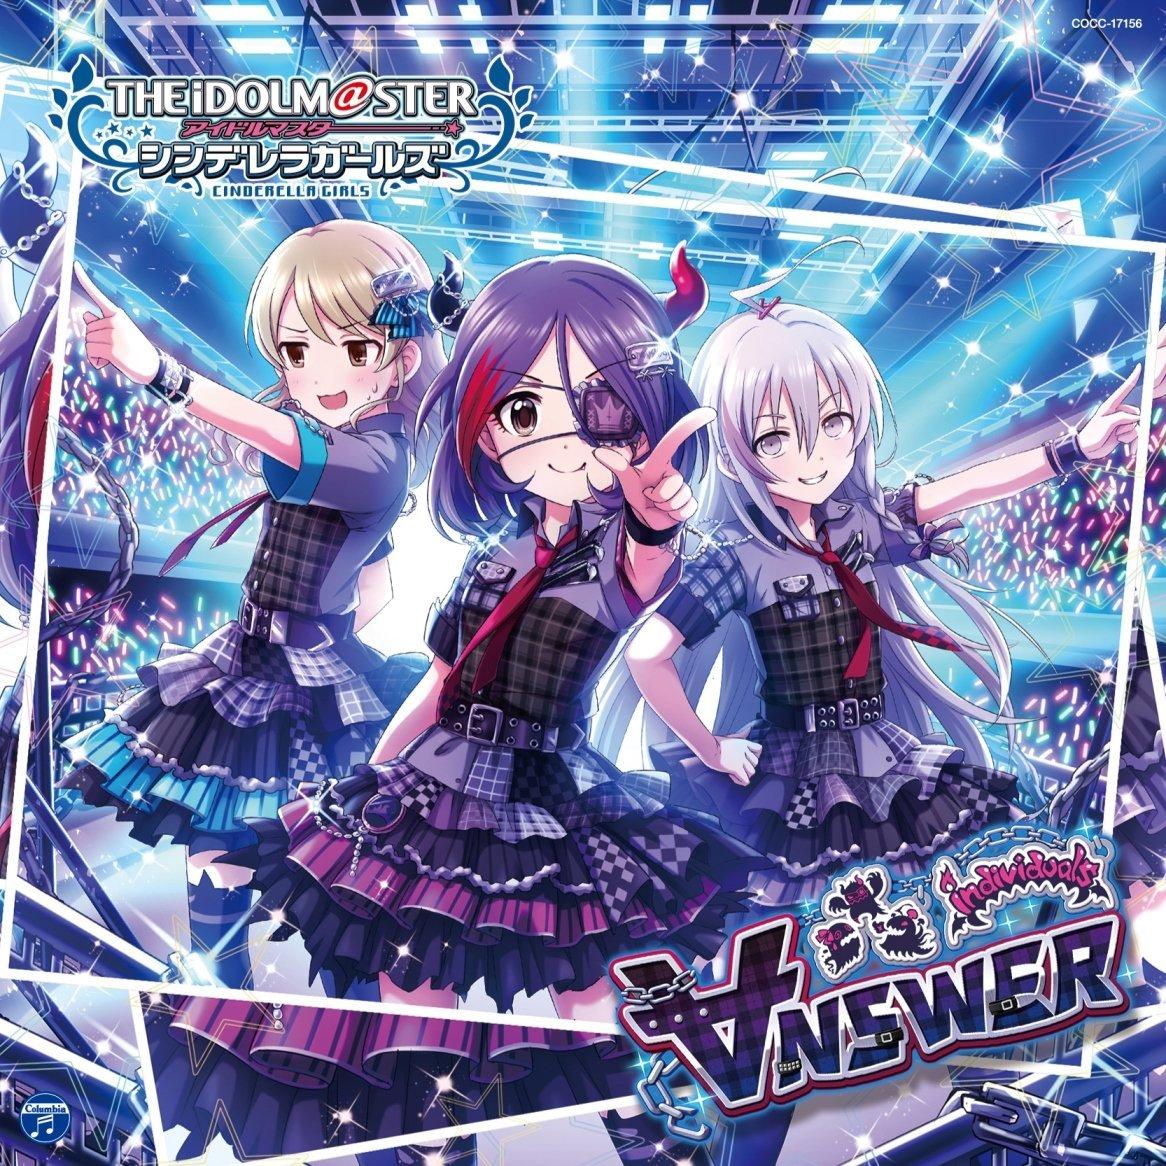 THE IDOLM@STER CINDERELLA GIRLS STARLIGHT MASTER 16 ∀NSWER [ (ゲーム・ミュージック) ]